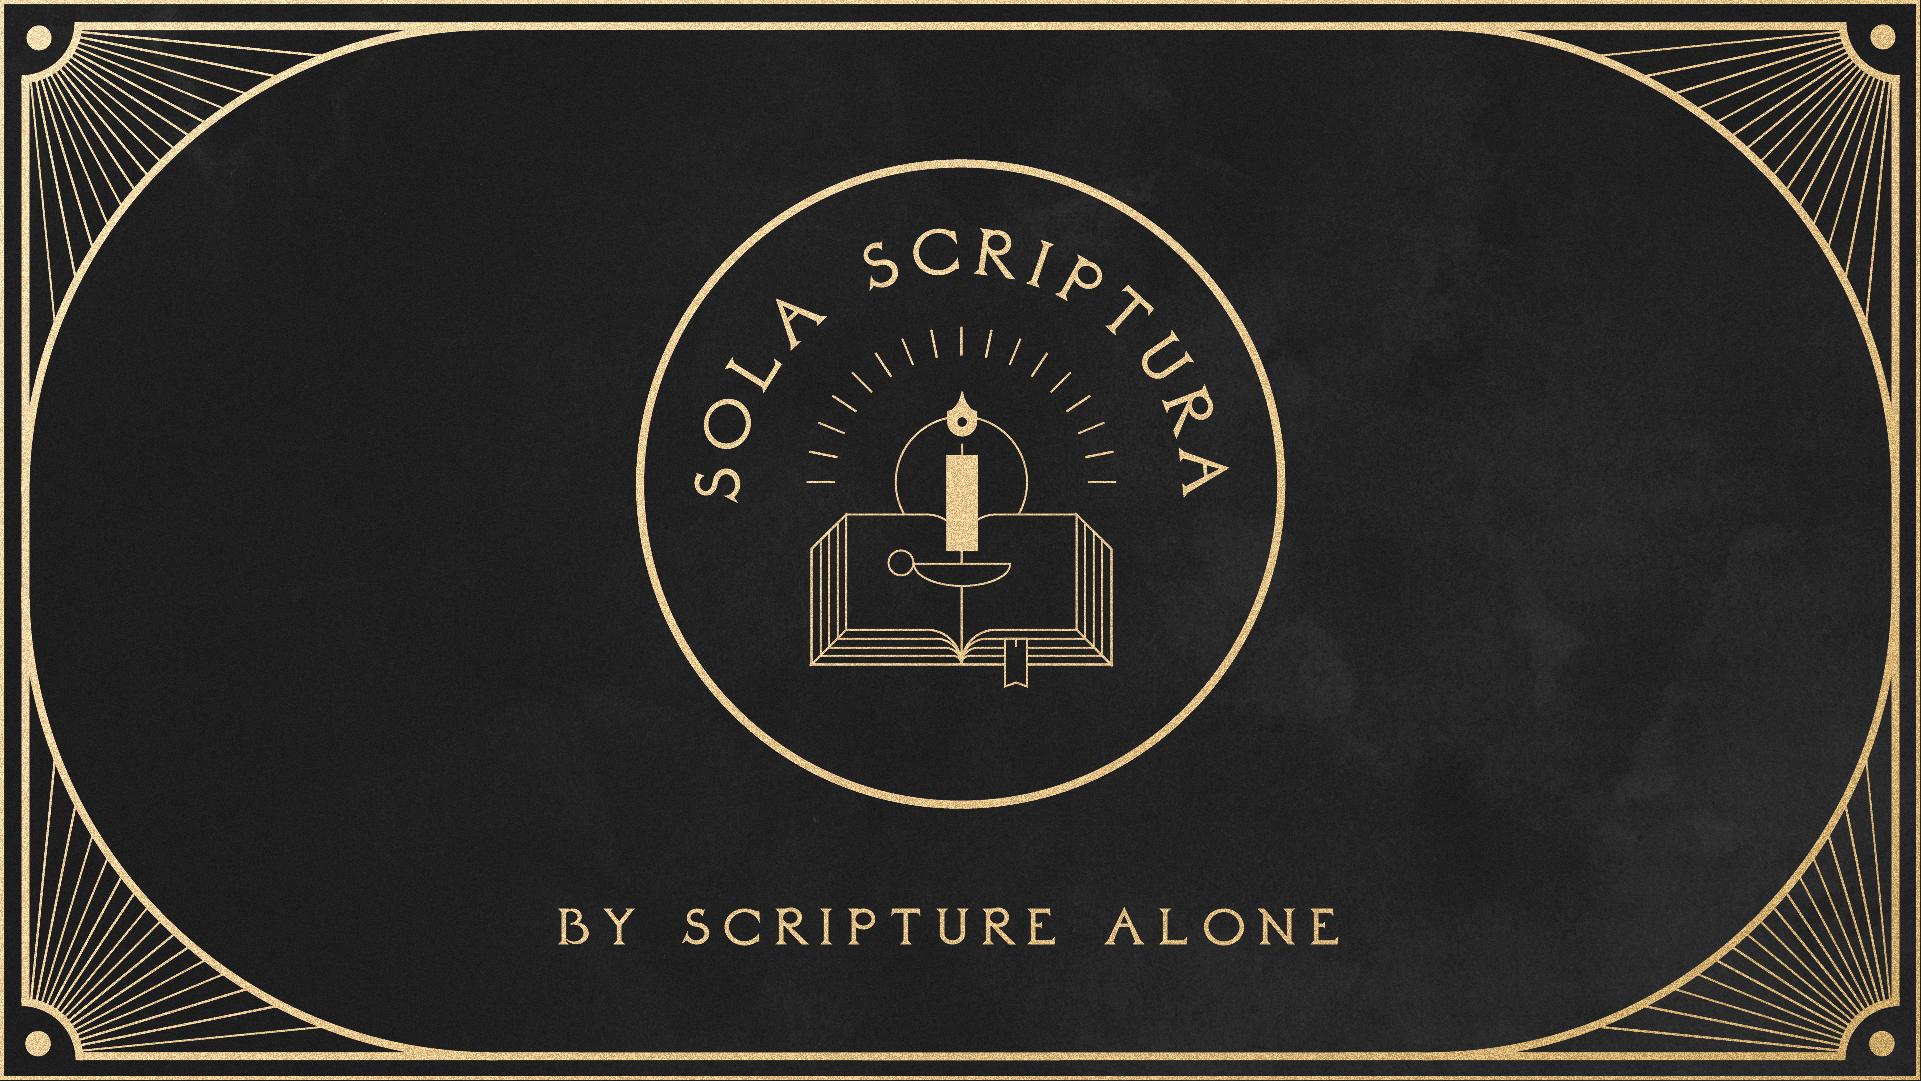 Sola Scriptura.jpg